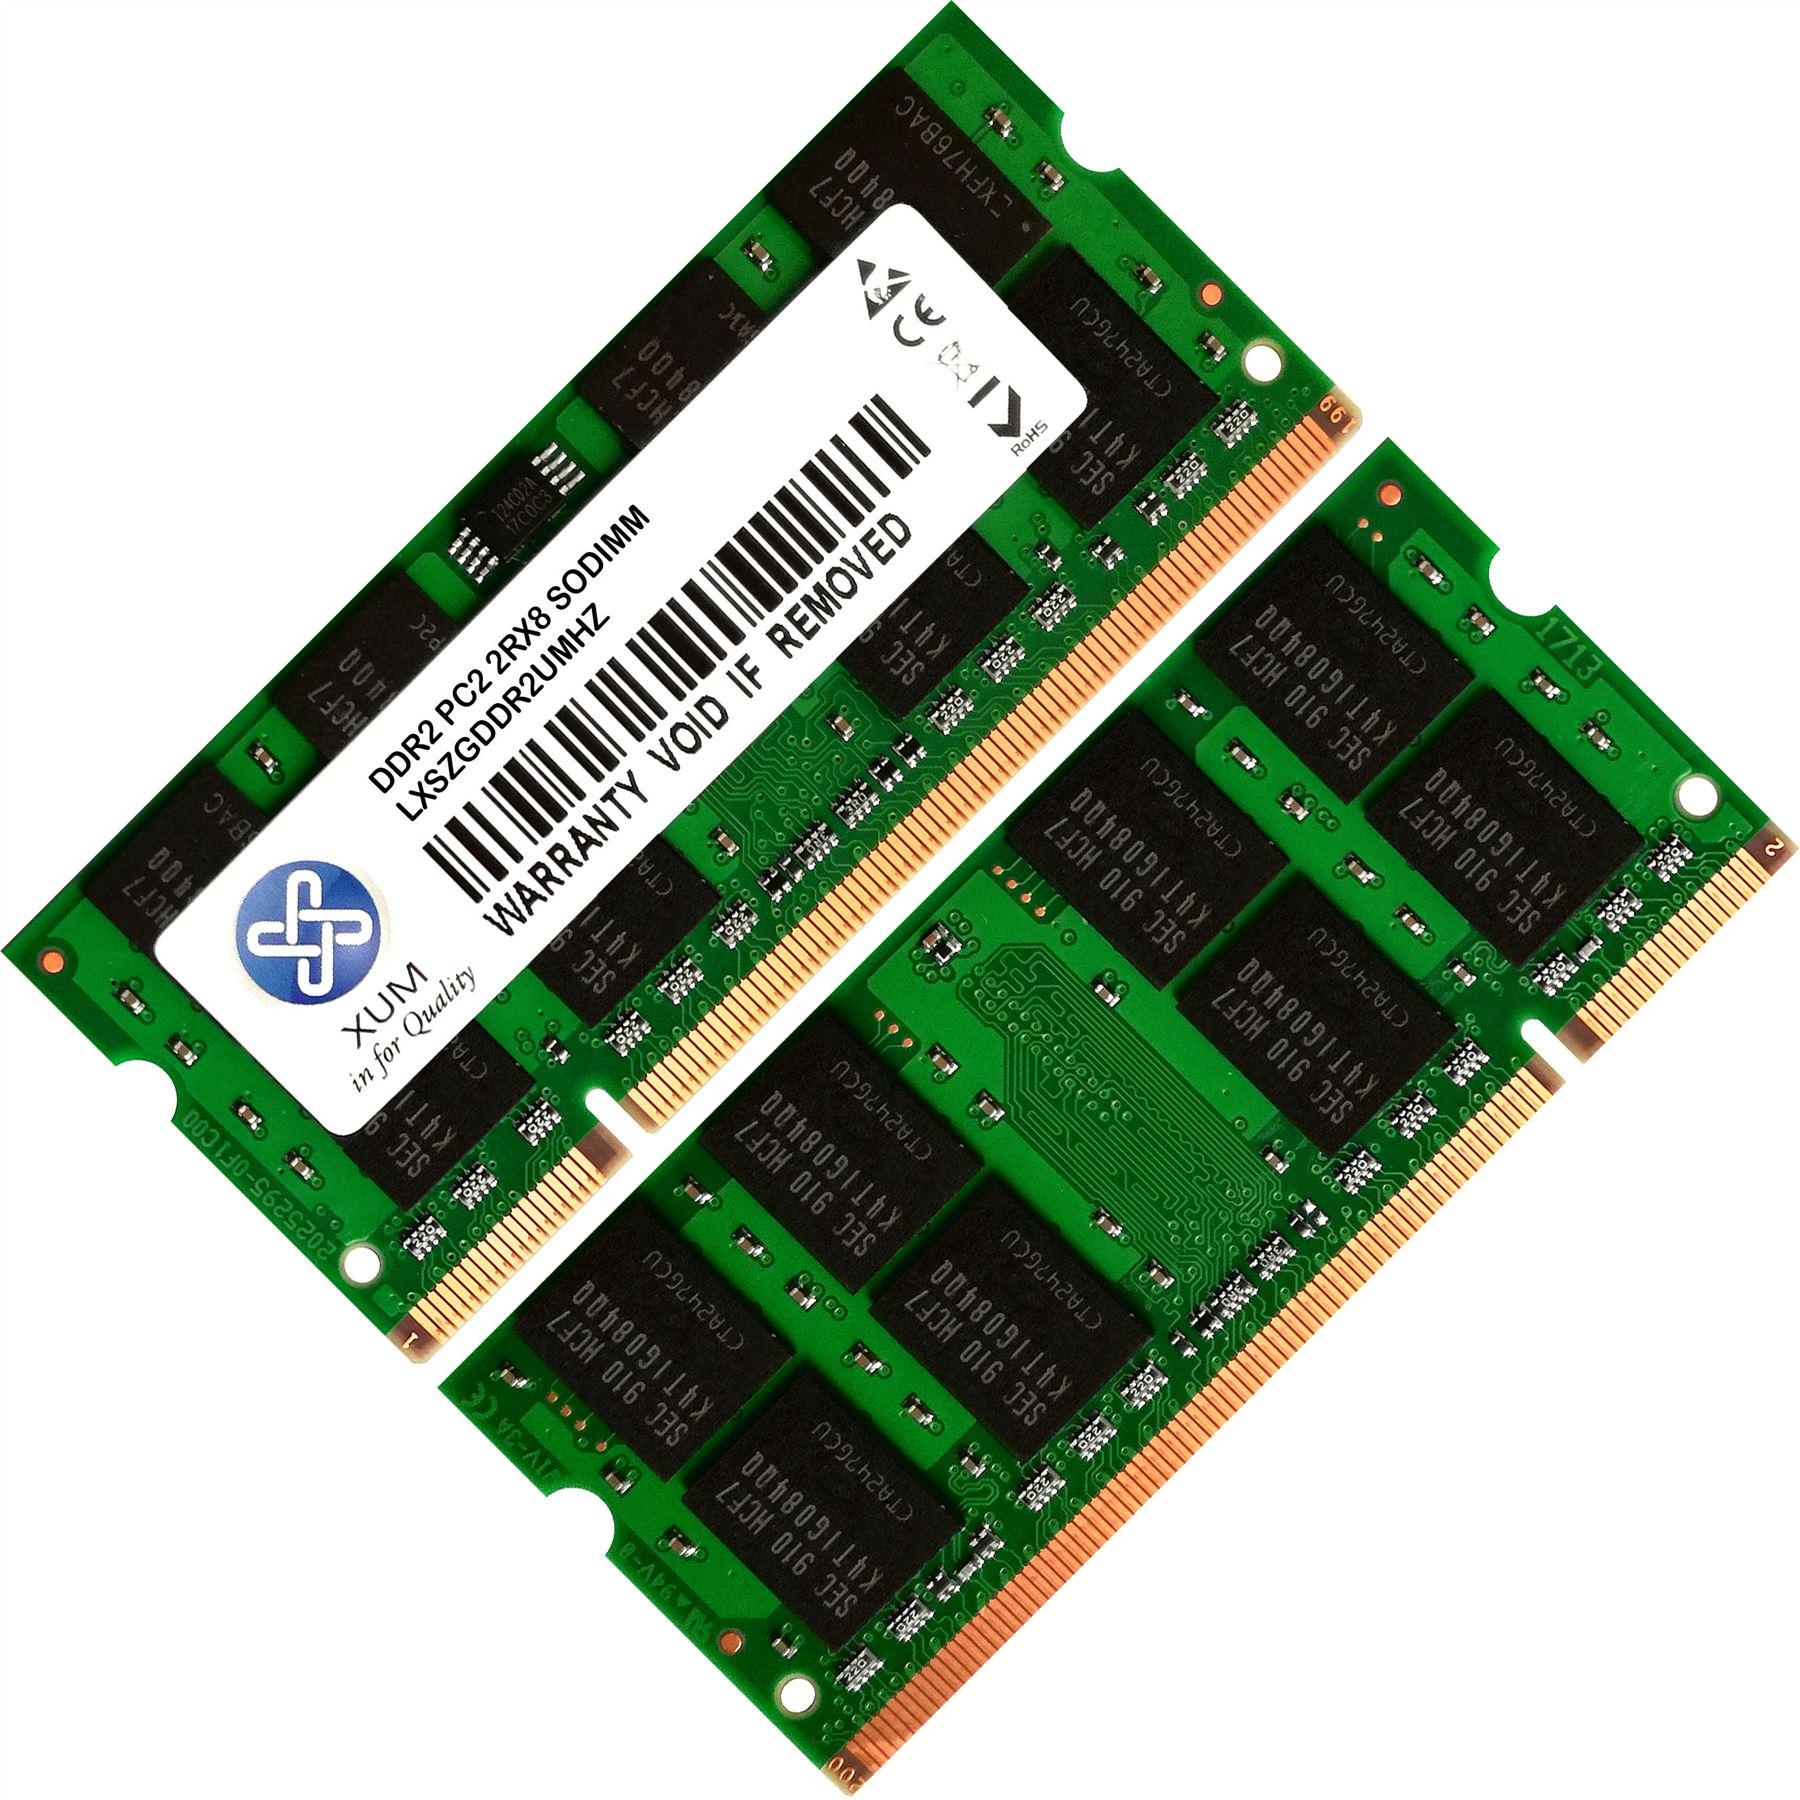 Memoria-Ram-4-Toshiba-Satellite-Laptop-A100-049-A100-05R010-A100-062-2x-Lot